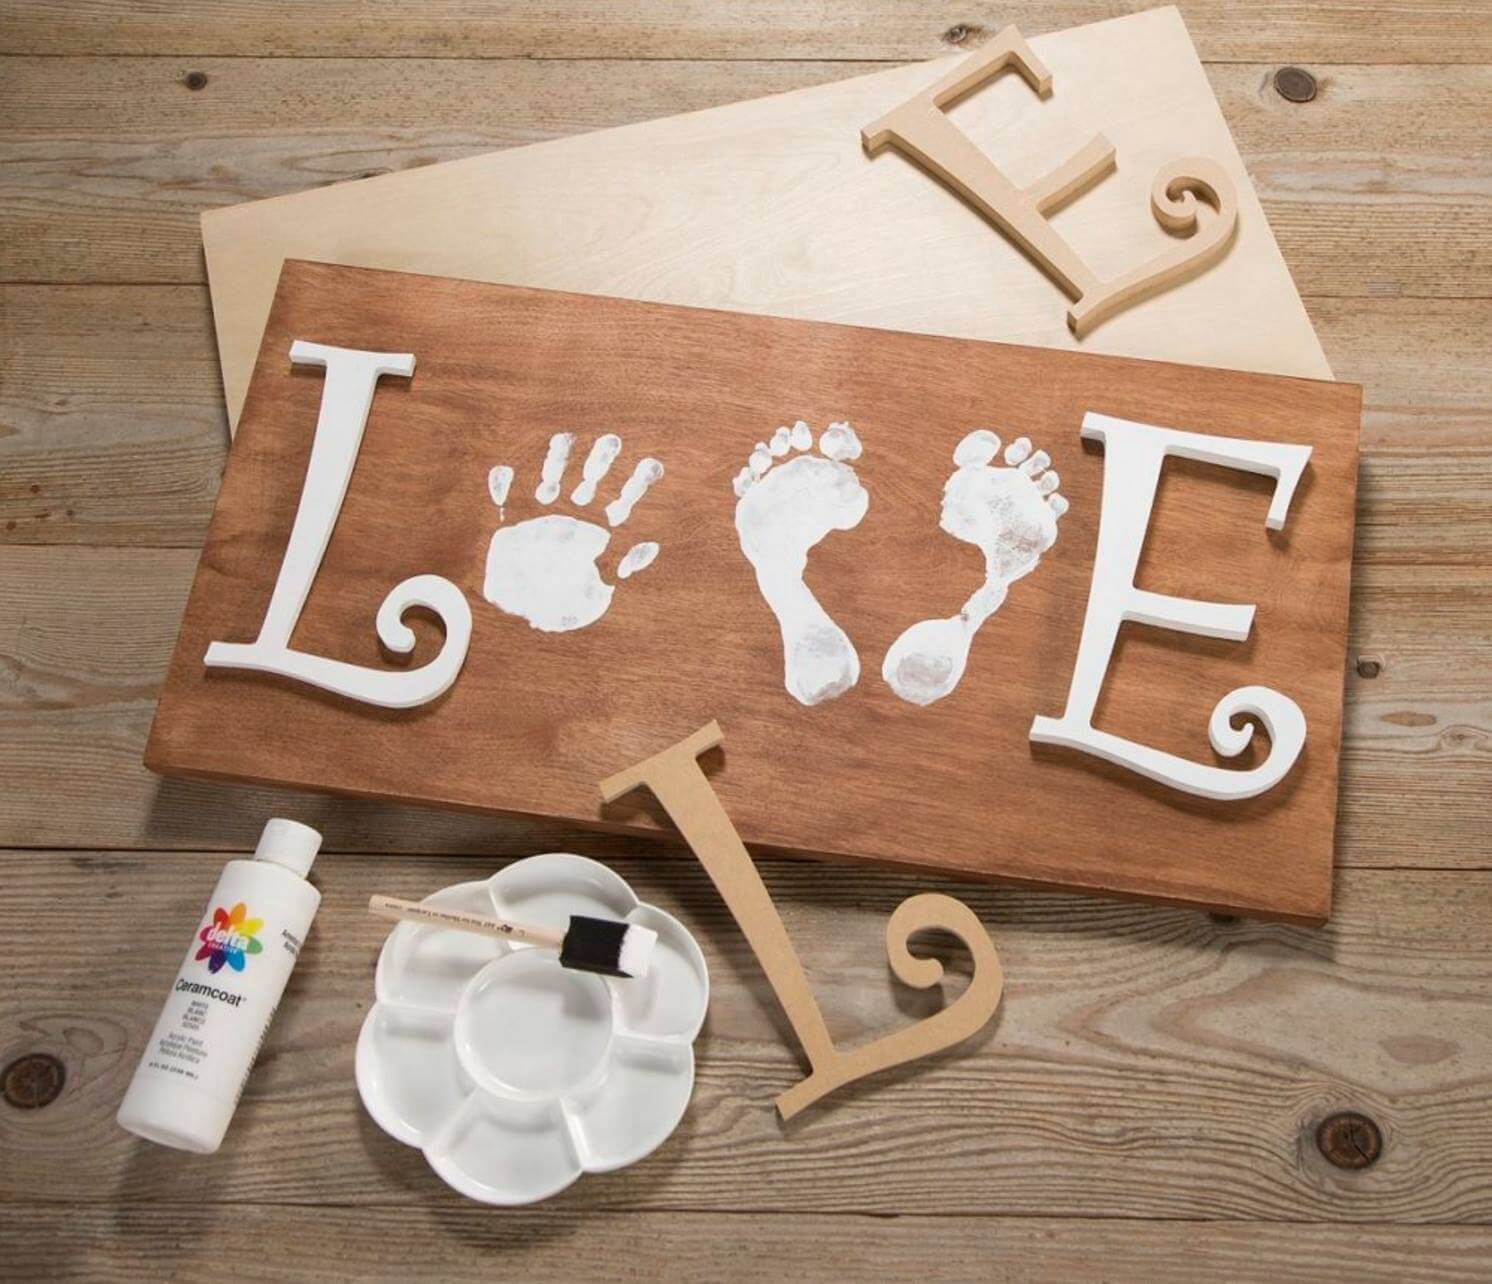 28 rustic love wood signs ideas homebnc.jpg